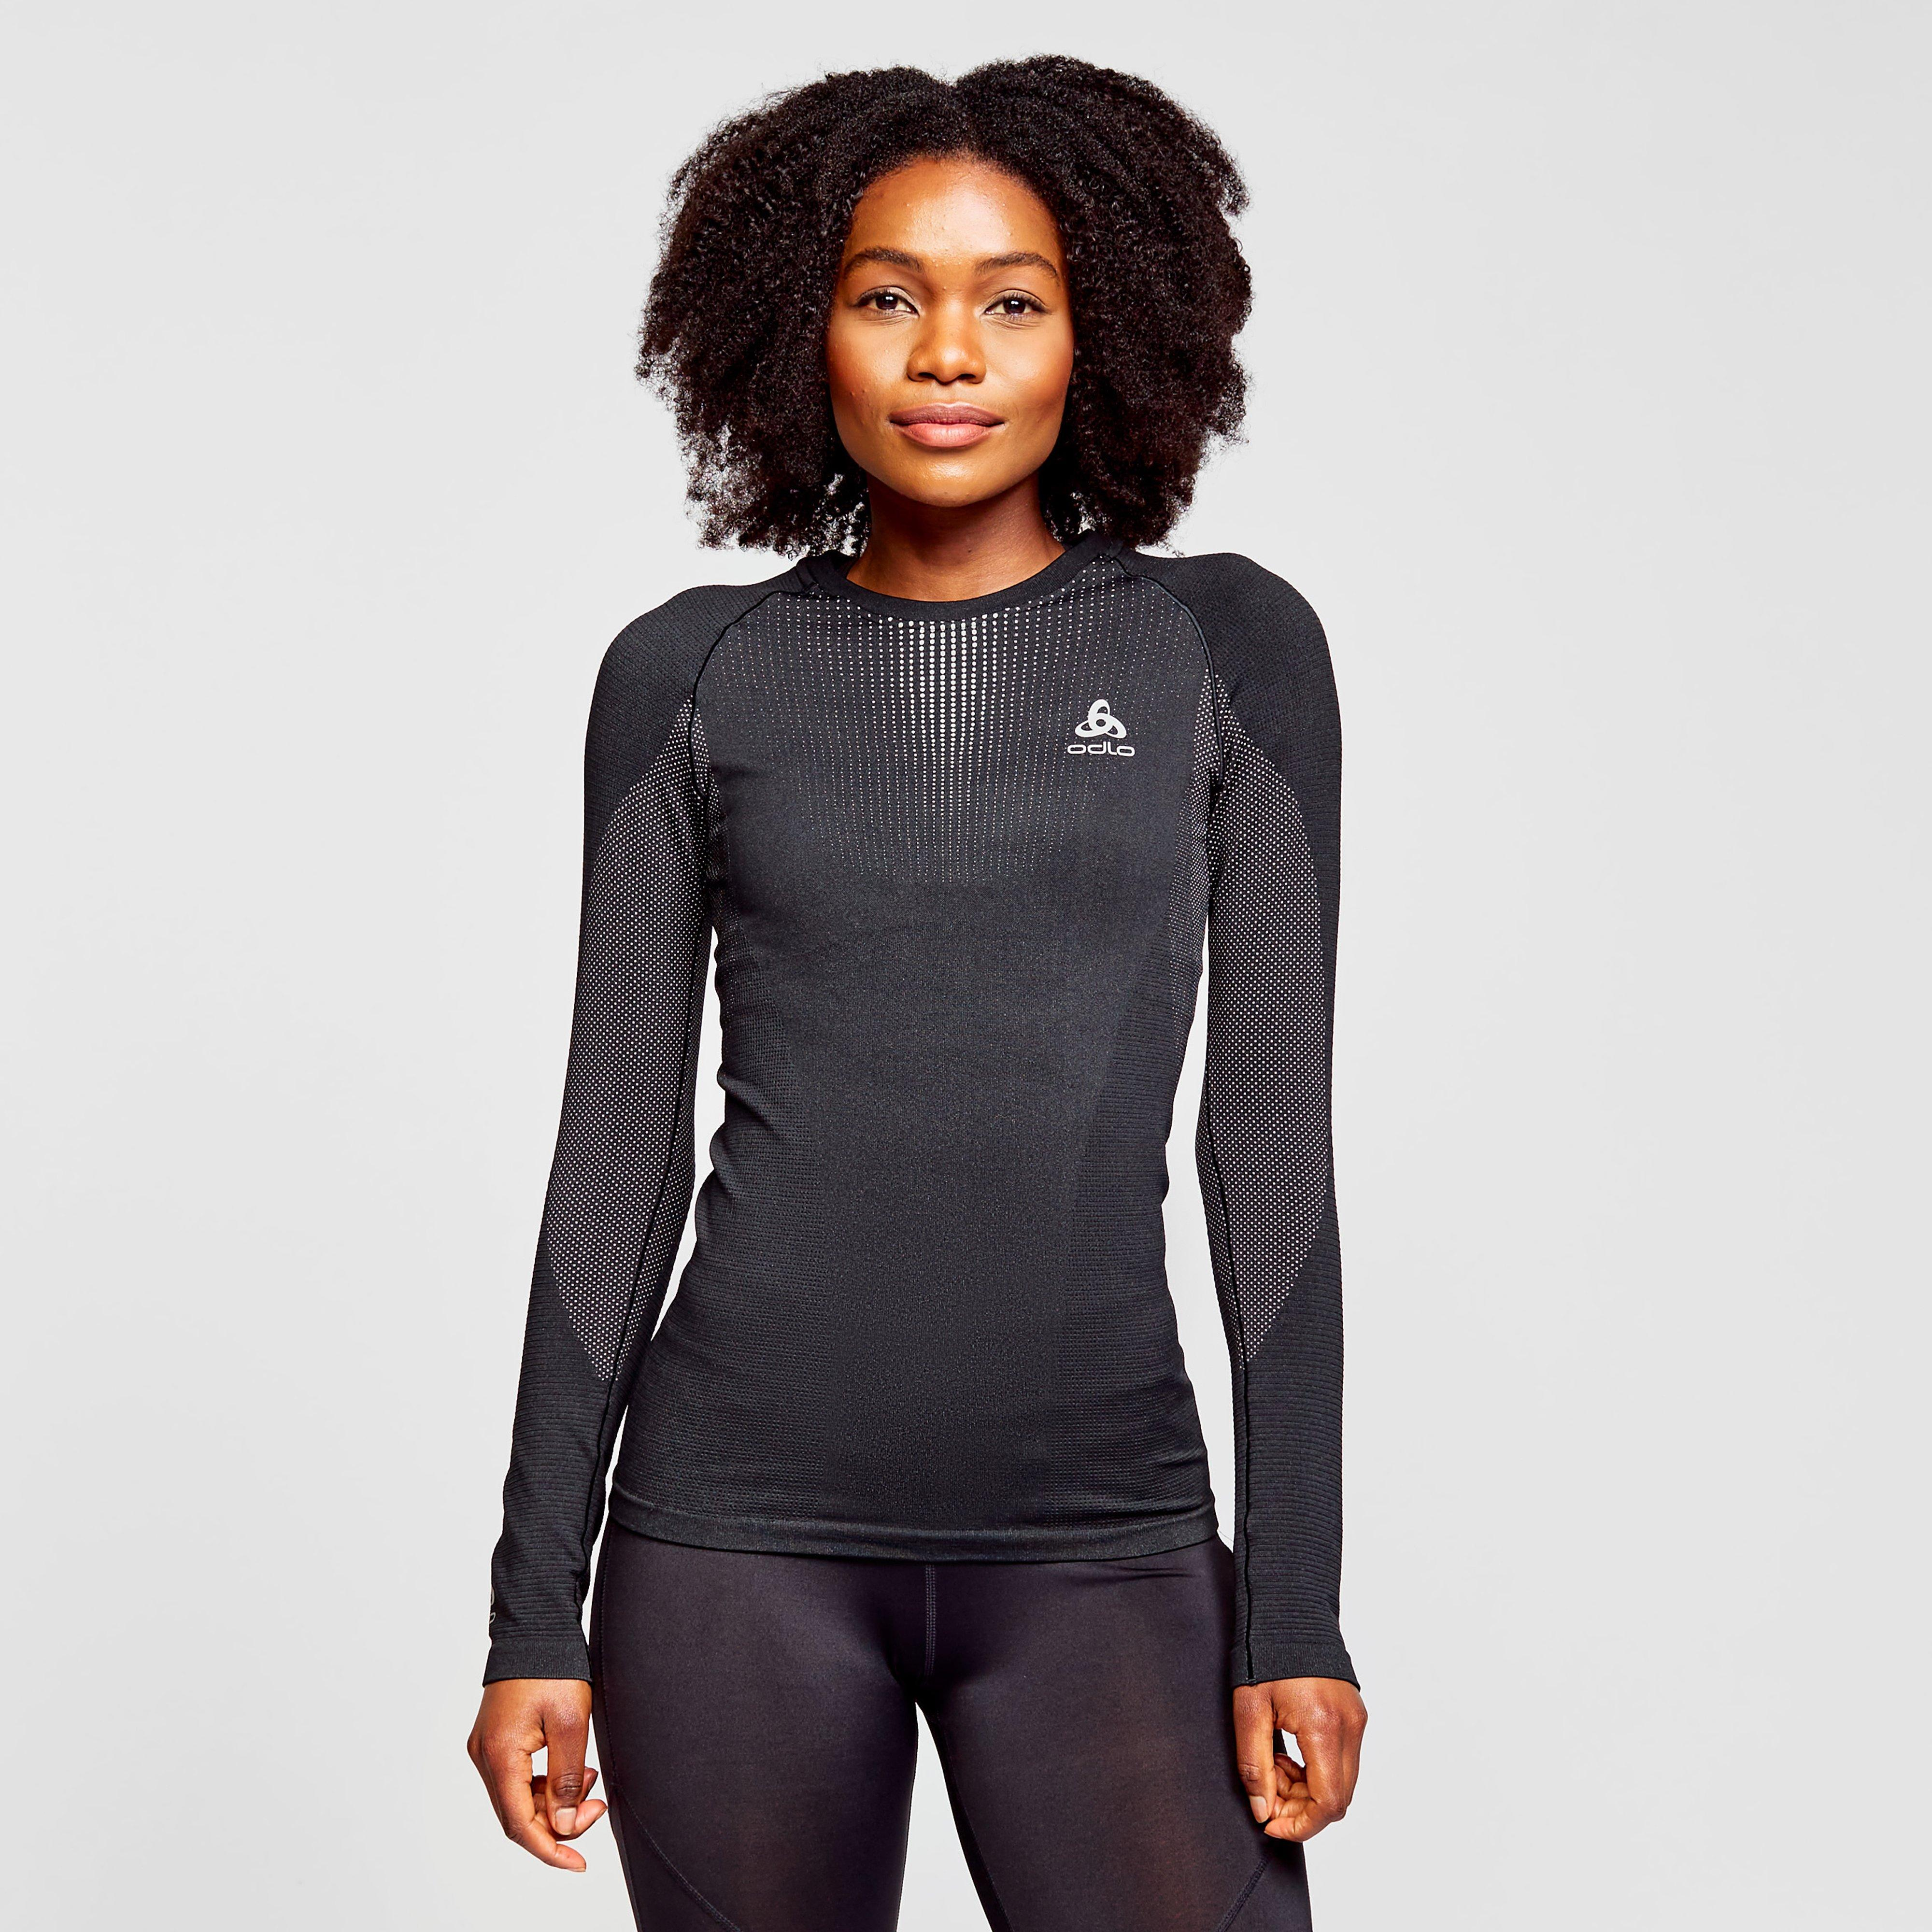 Odlo Odlo Womens Performance Warm Long Sleeve Base Layer Top - Black, Black